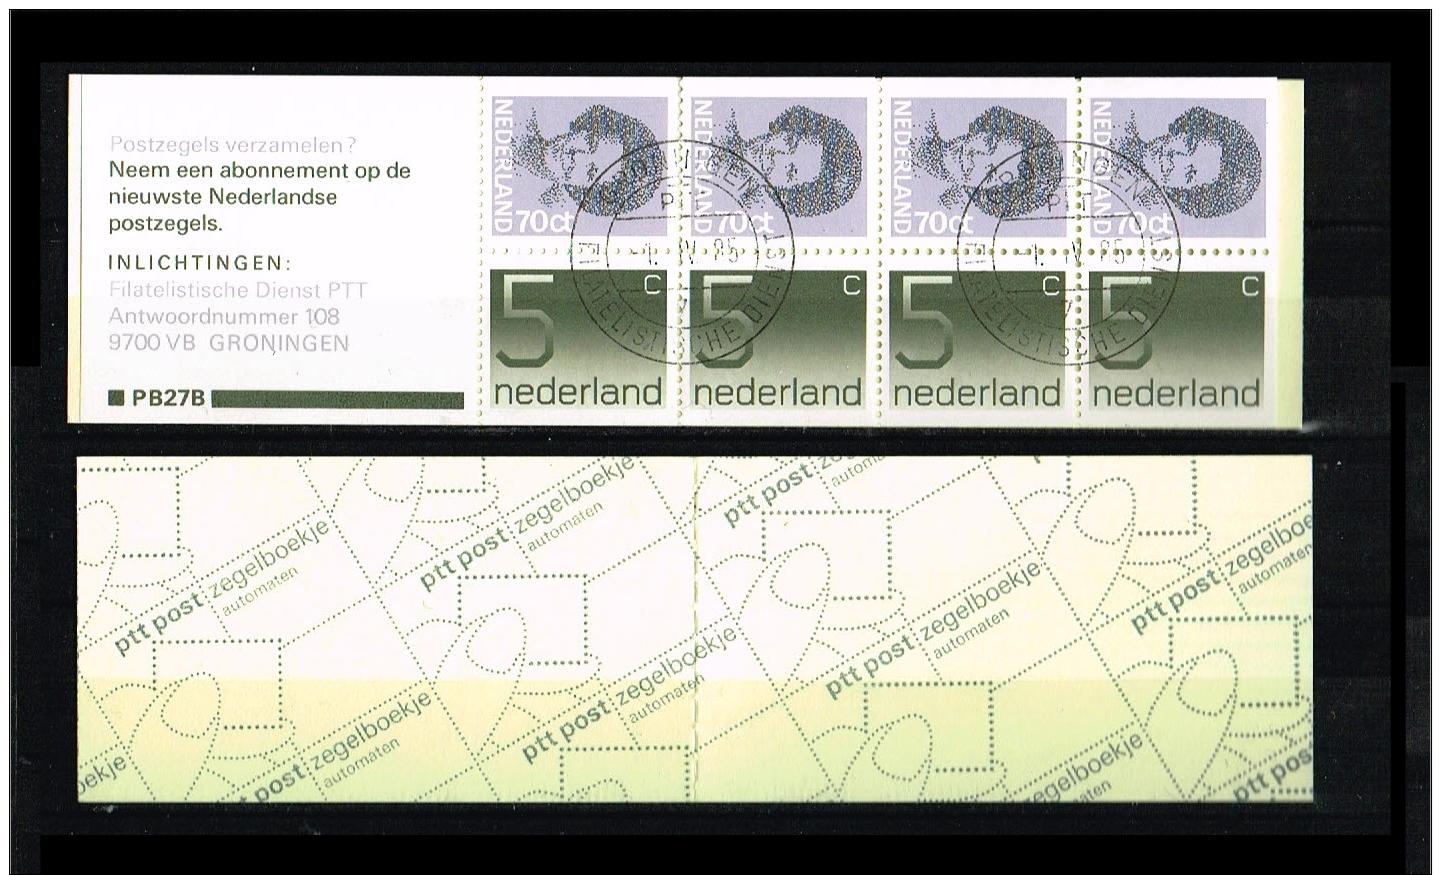 1985 - Netherlands NVPH PB27b Used - Stampbooklet PB27b: 4x70 +4x5 [A56_101] - Postzegelboekjes En Roltandingzegels